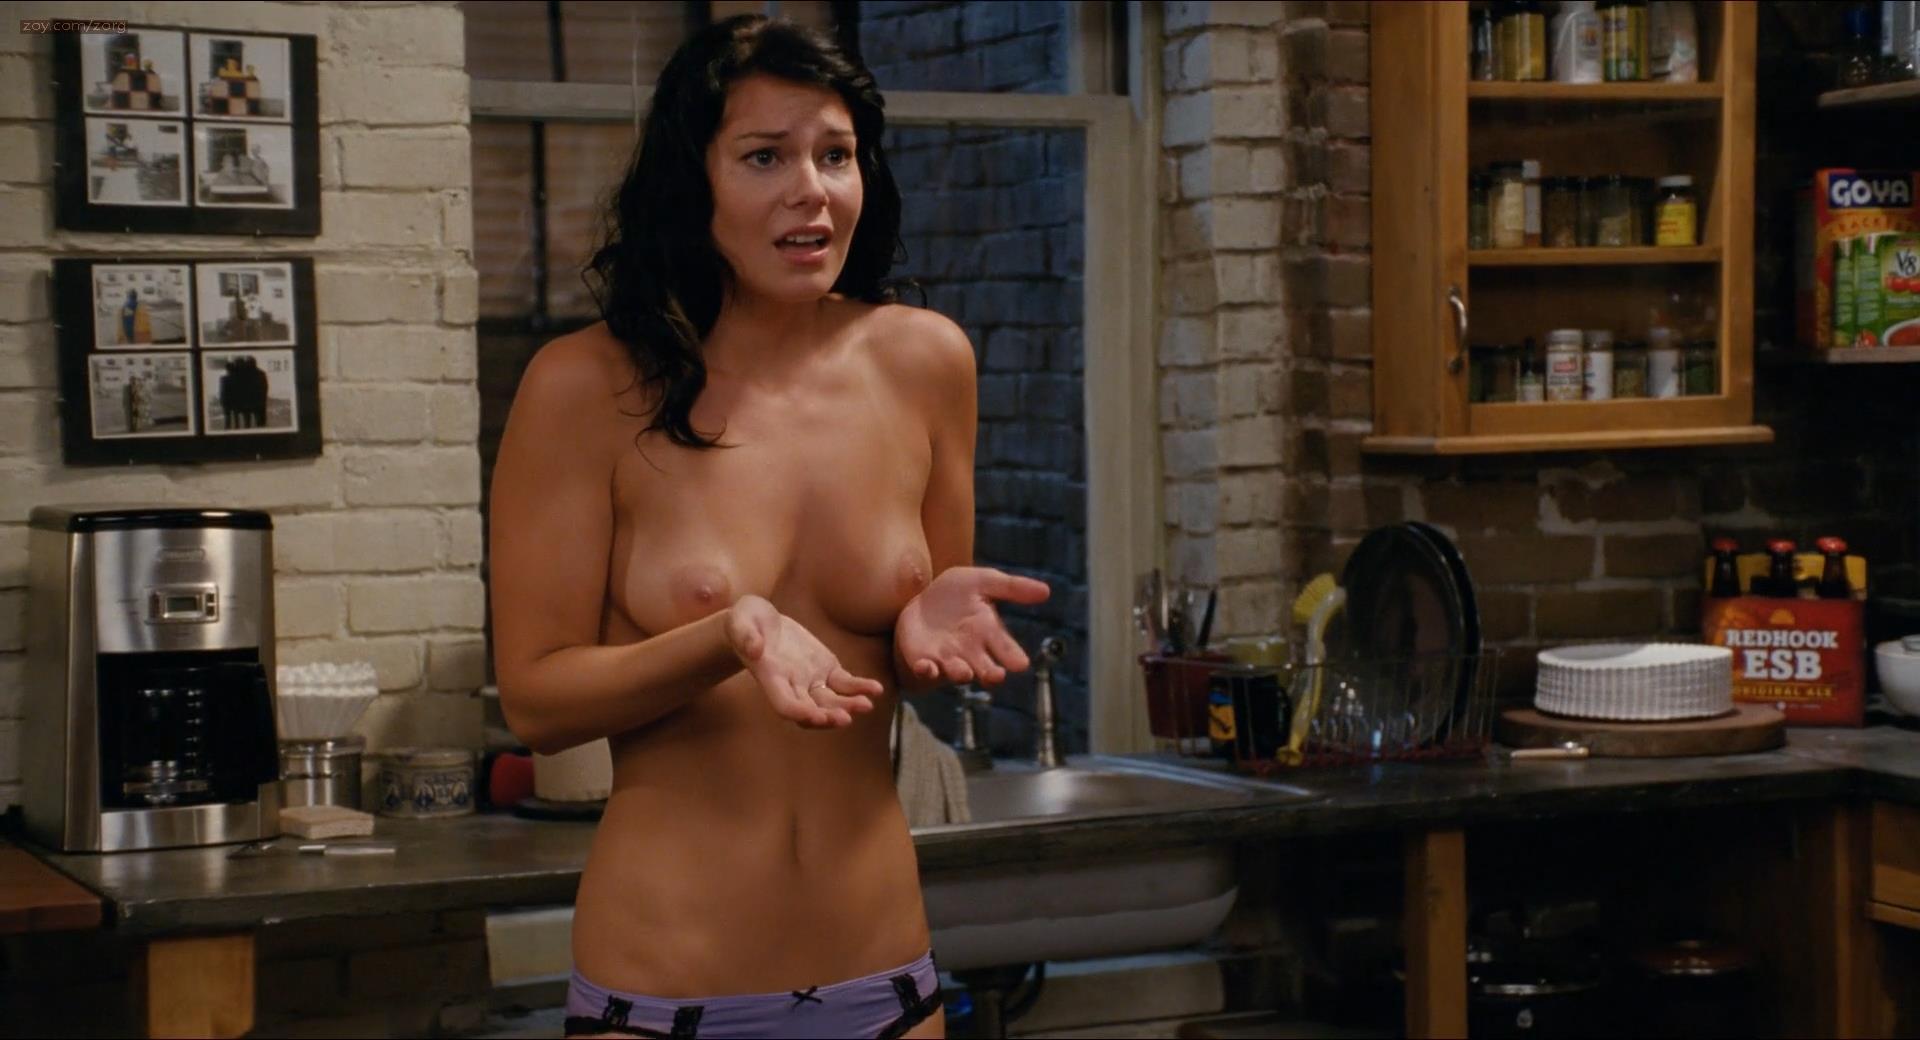 Kate simses nude